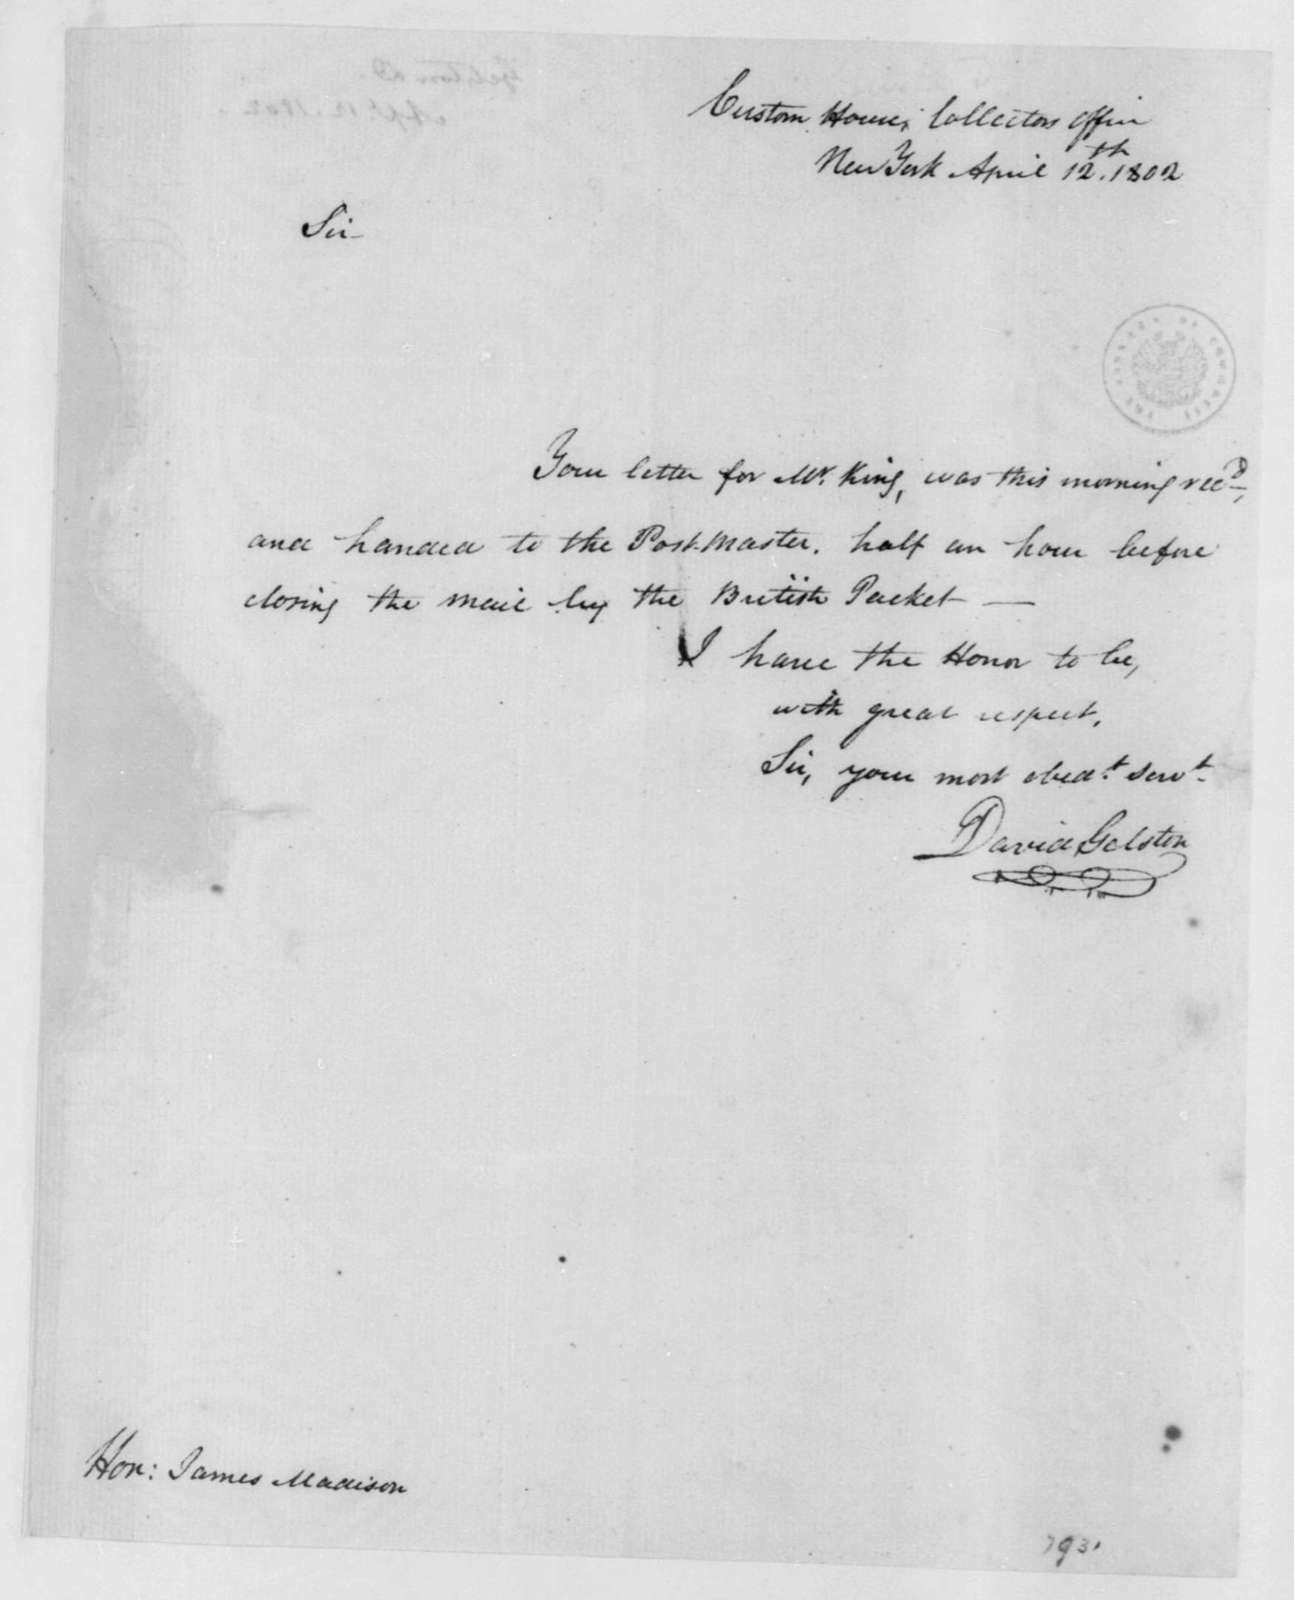 David Gelston to James Madison, April 12, 1802.